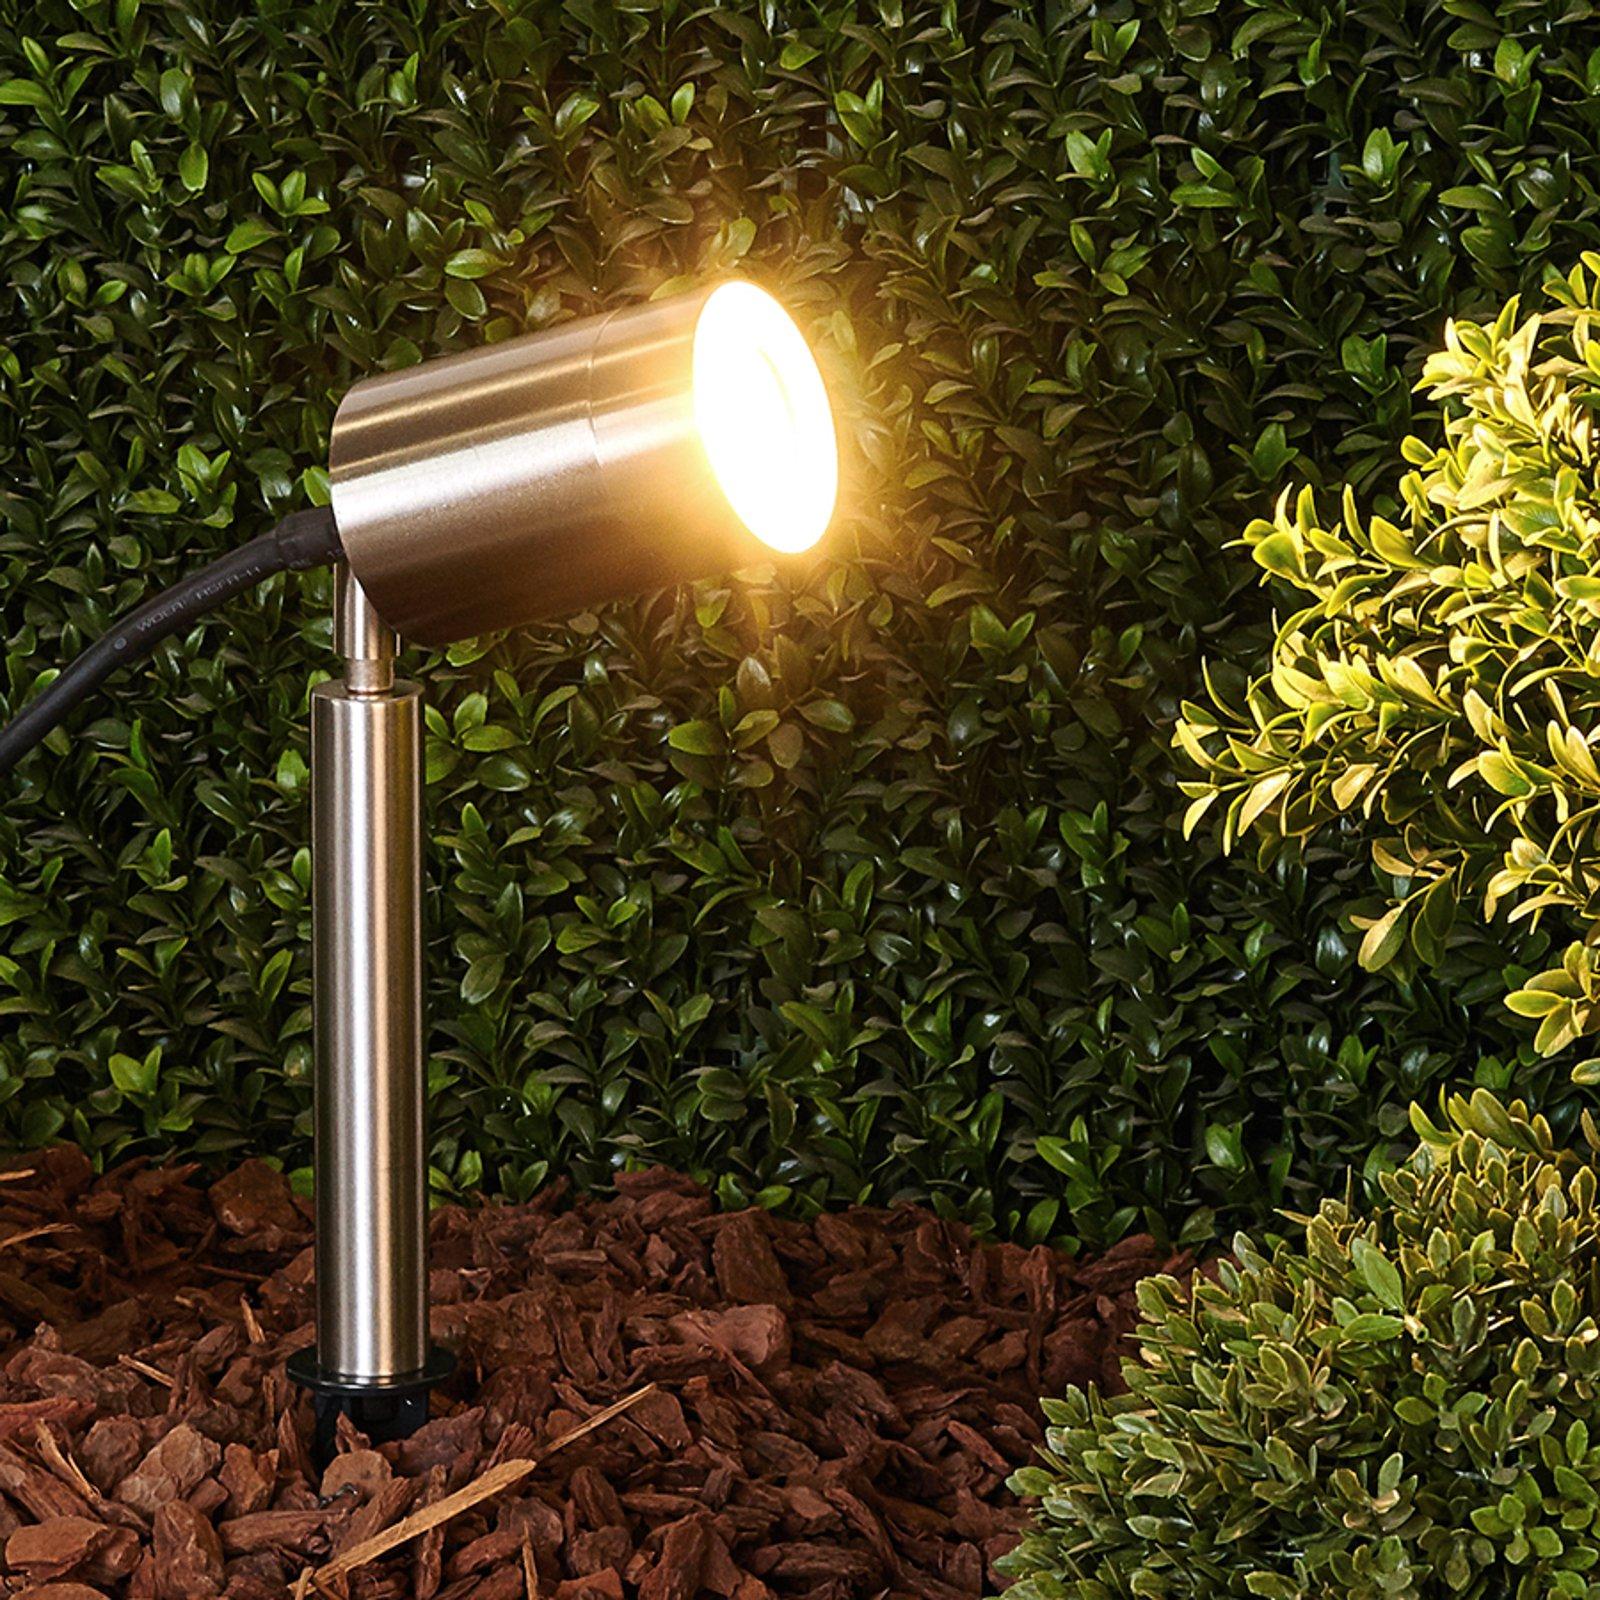 Eske - jordspydlampe av rustfritt stål, GU10-pære